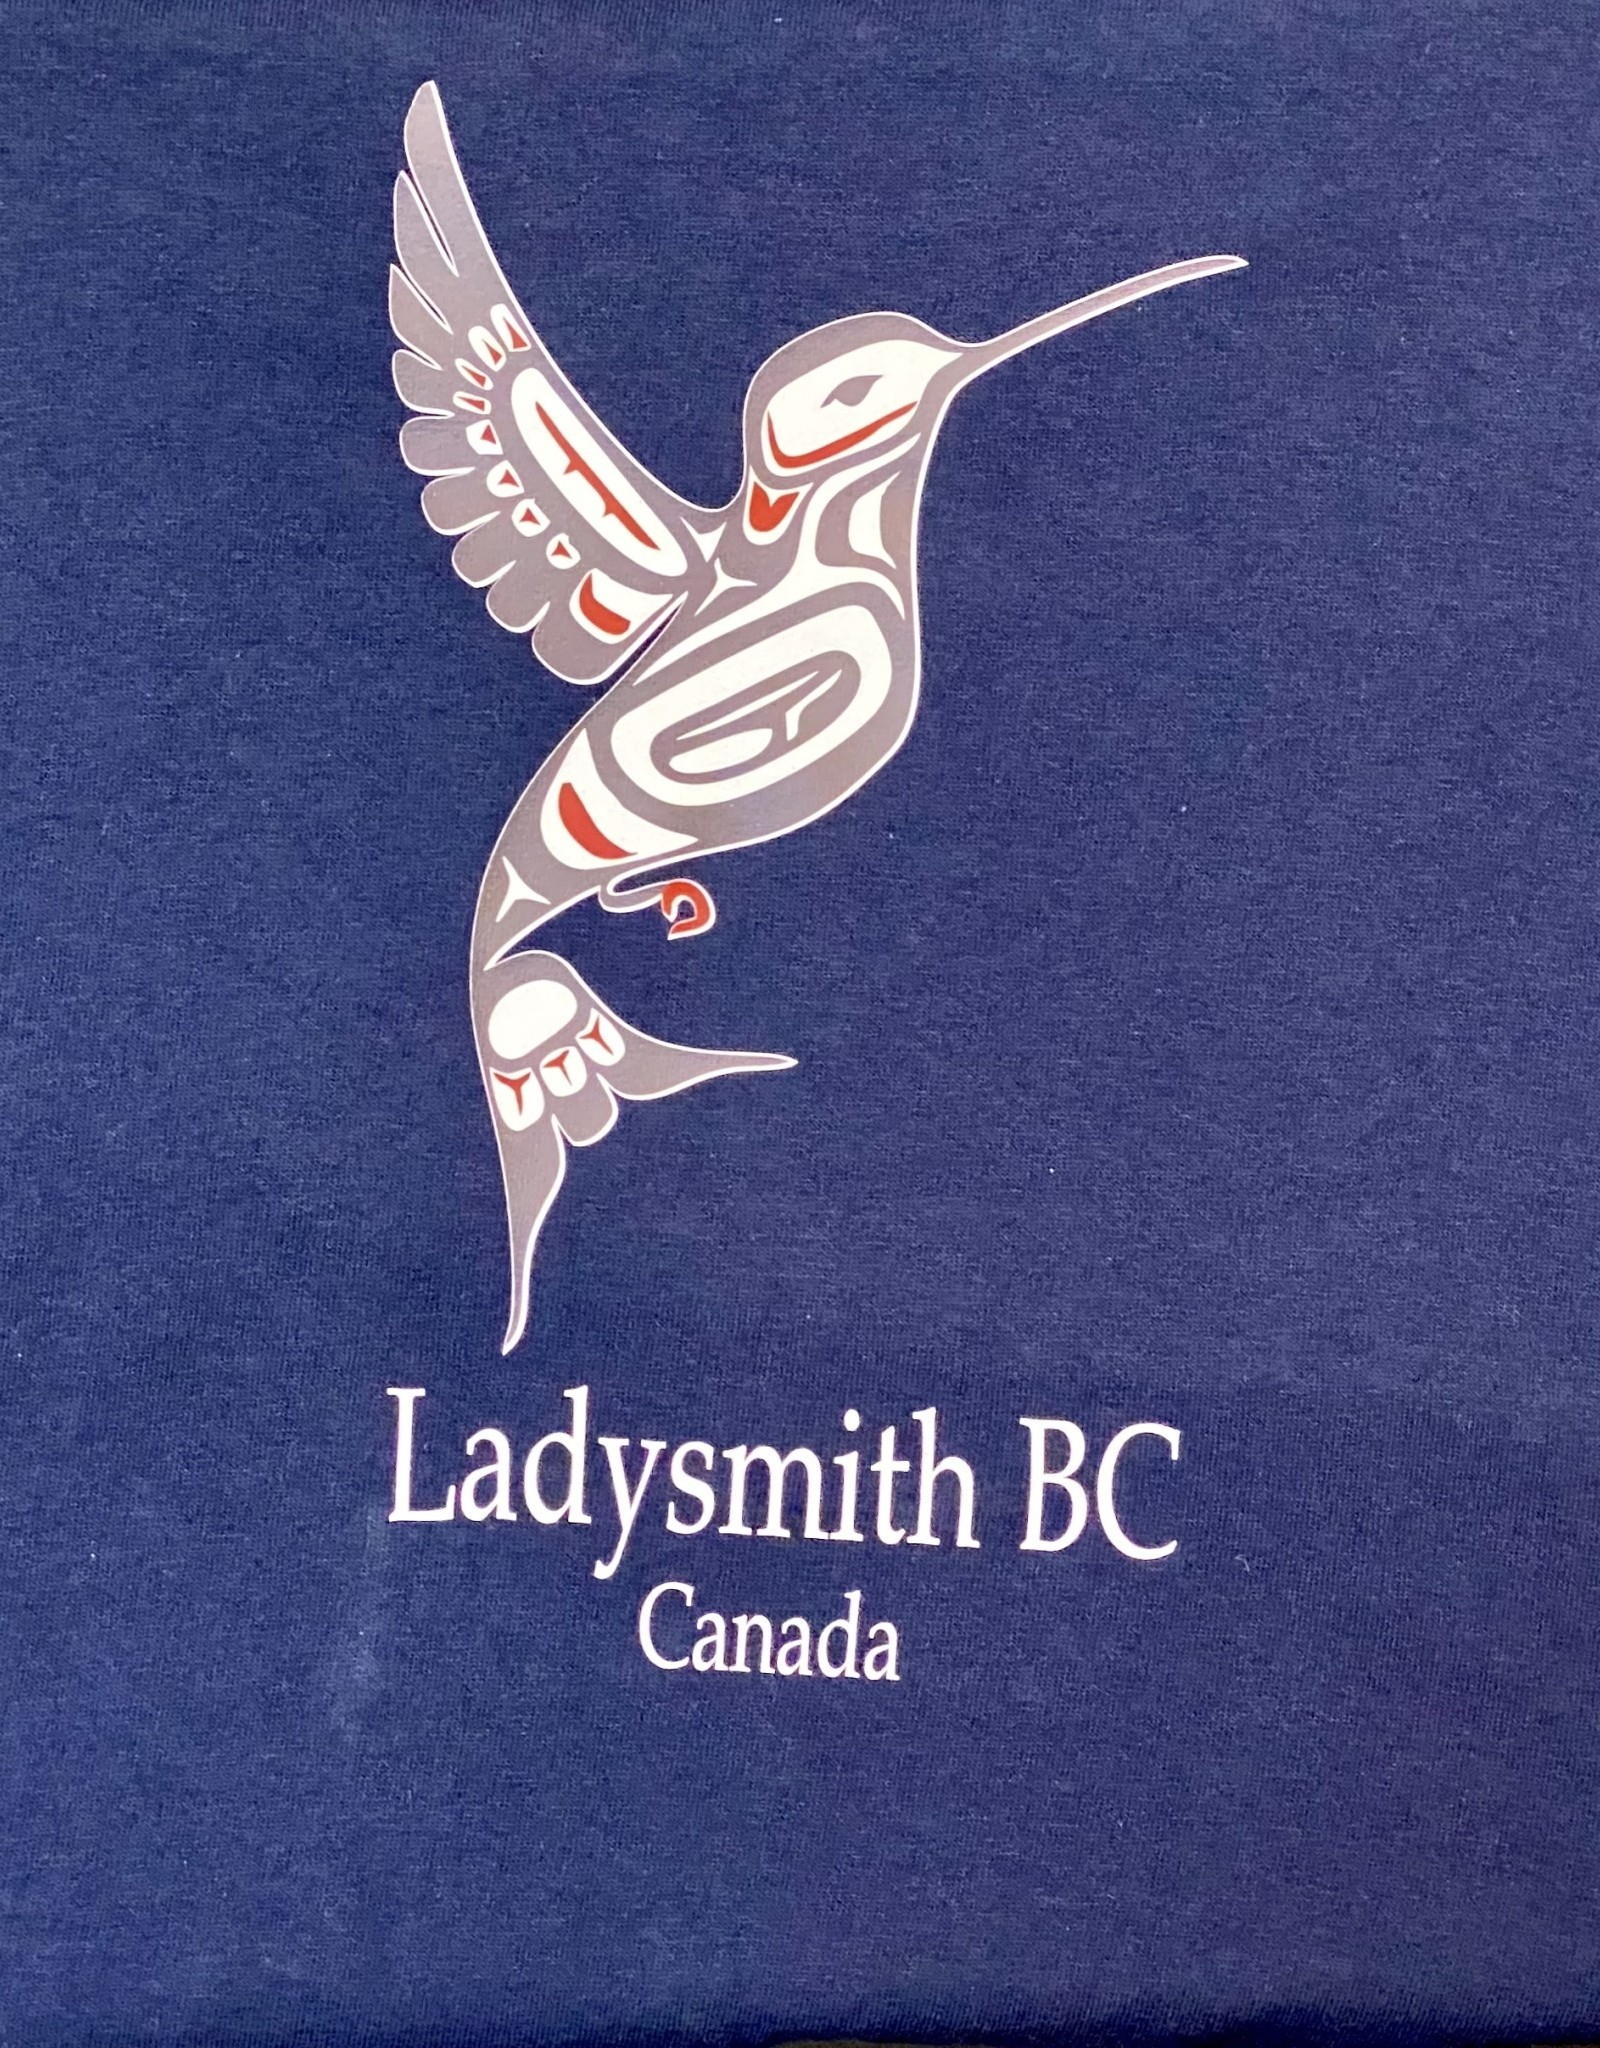 Ladysmith T-Shirts